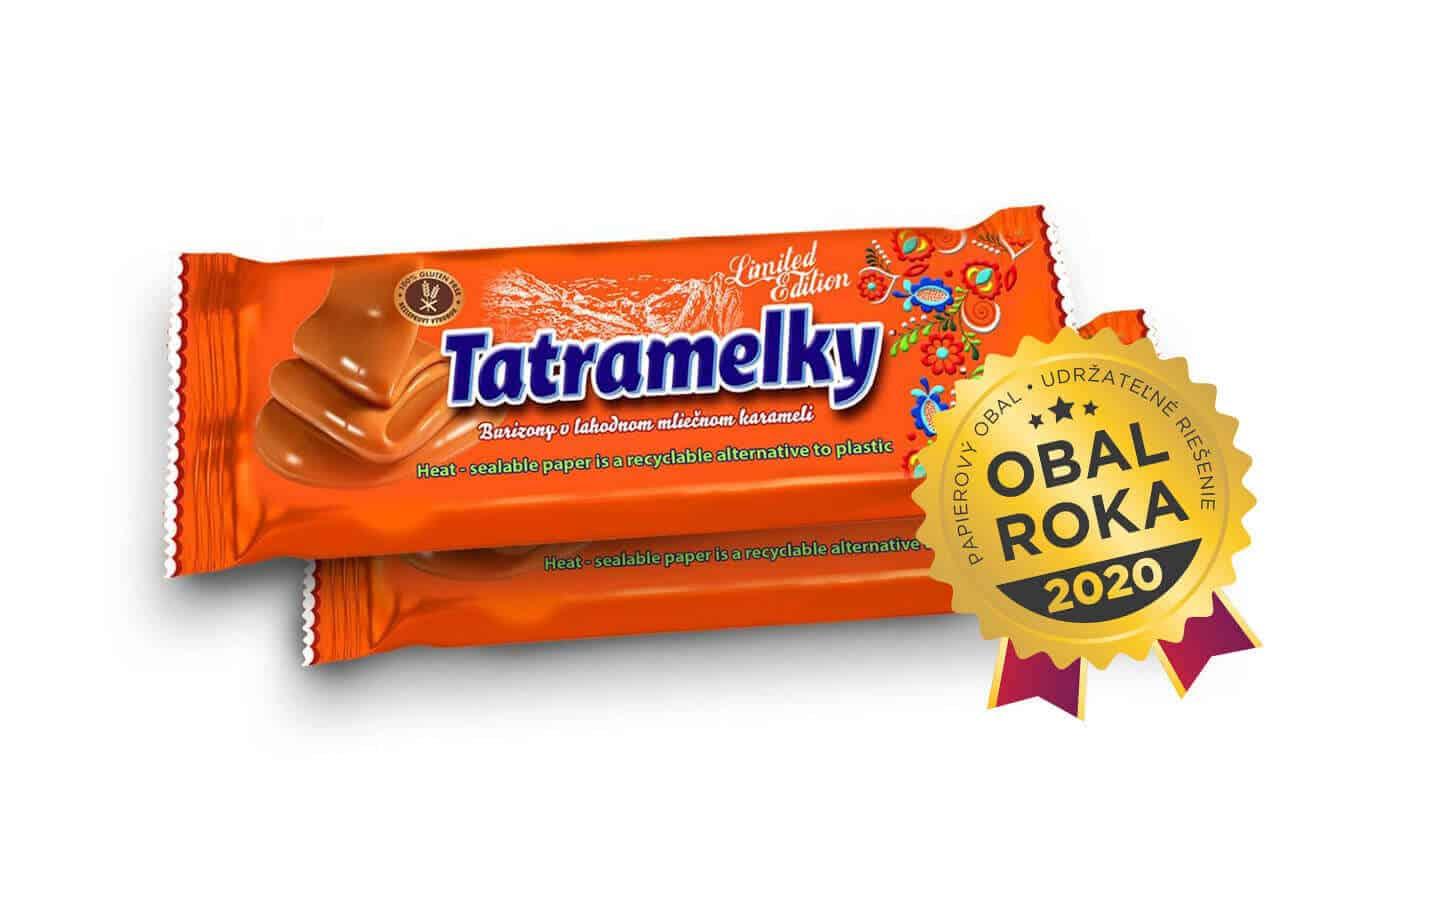 Tatramelky - Obal roka 2020